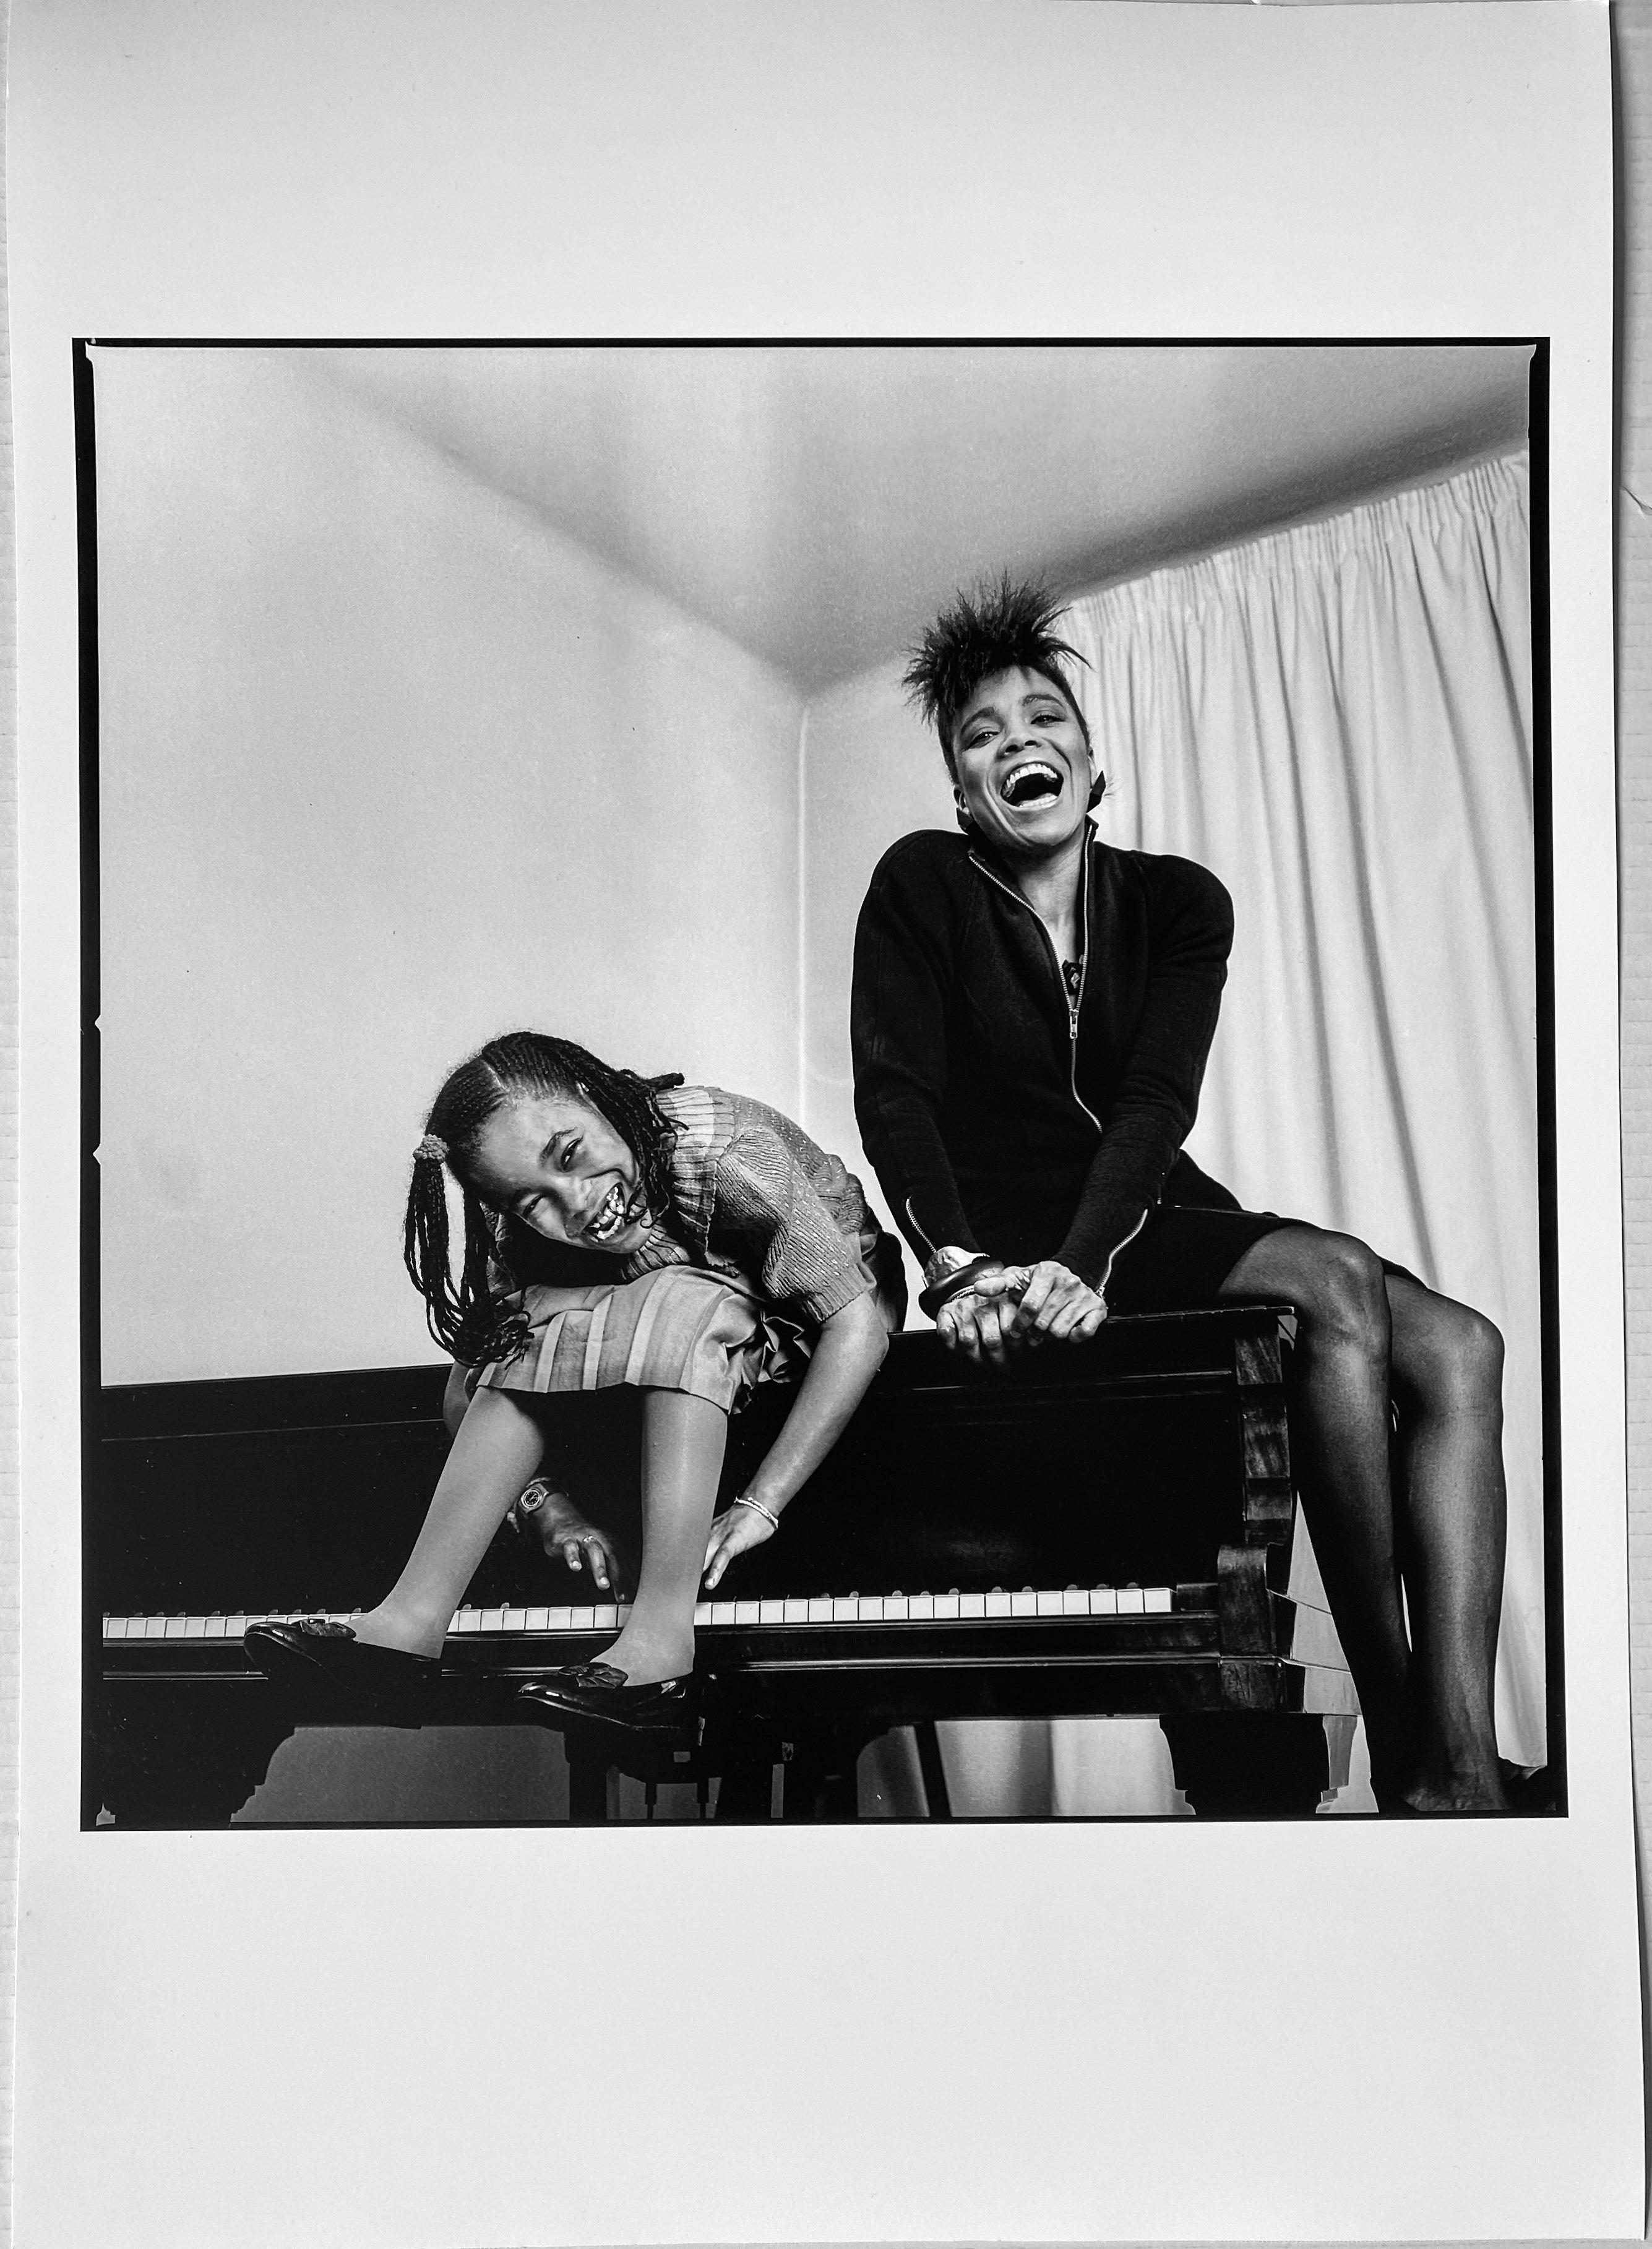 Dee Dee Bridgewater and Daughter China Moses, Paris, Musician Portrait 1980s